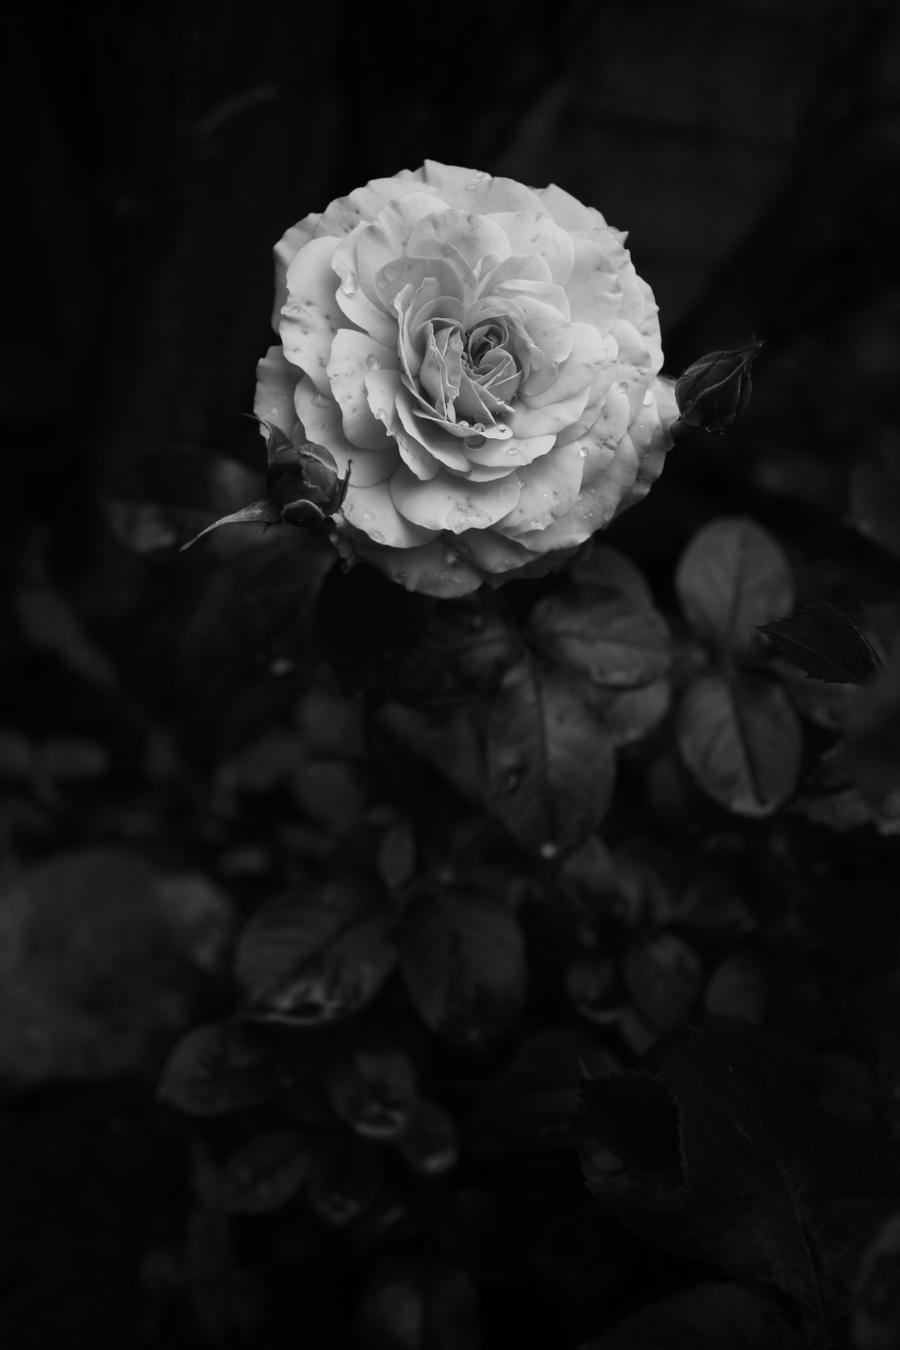 White Rose by JesssssT